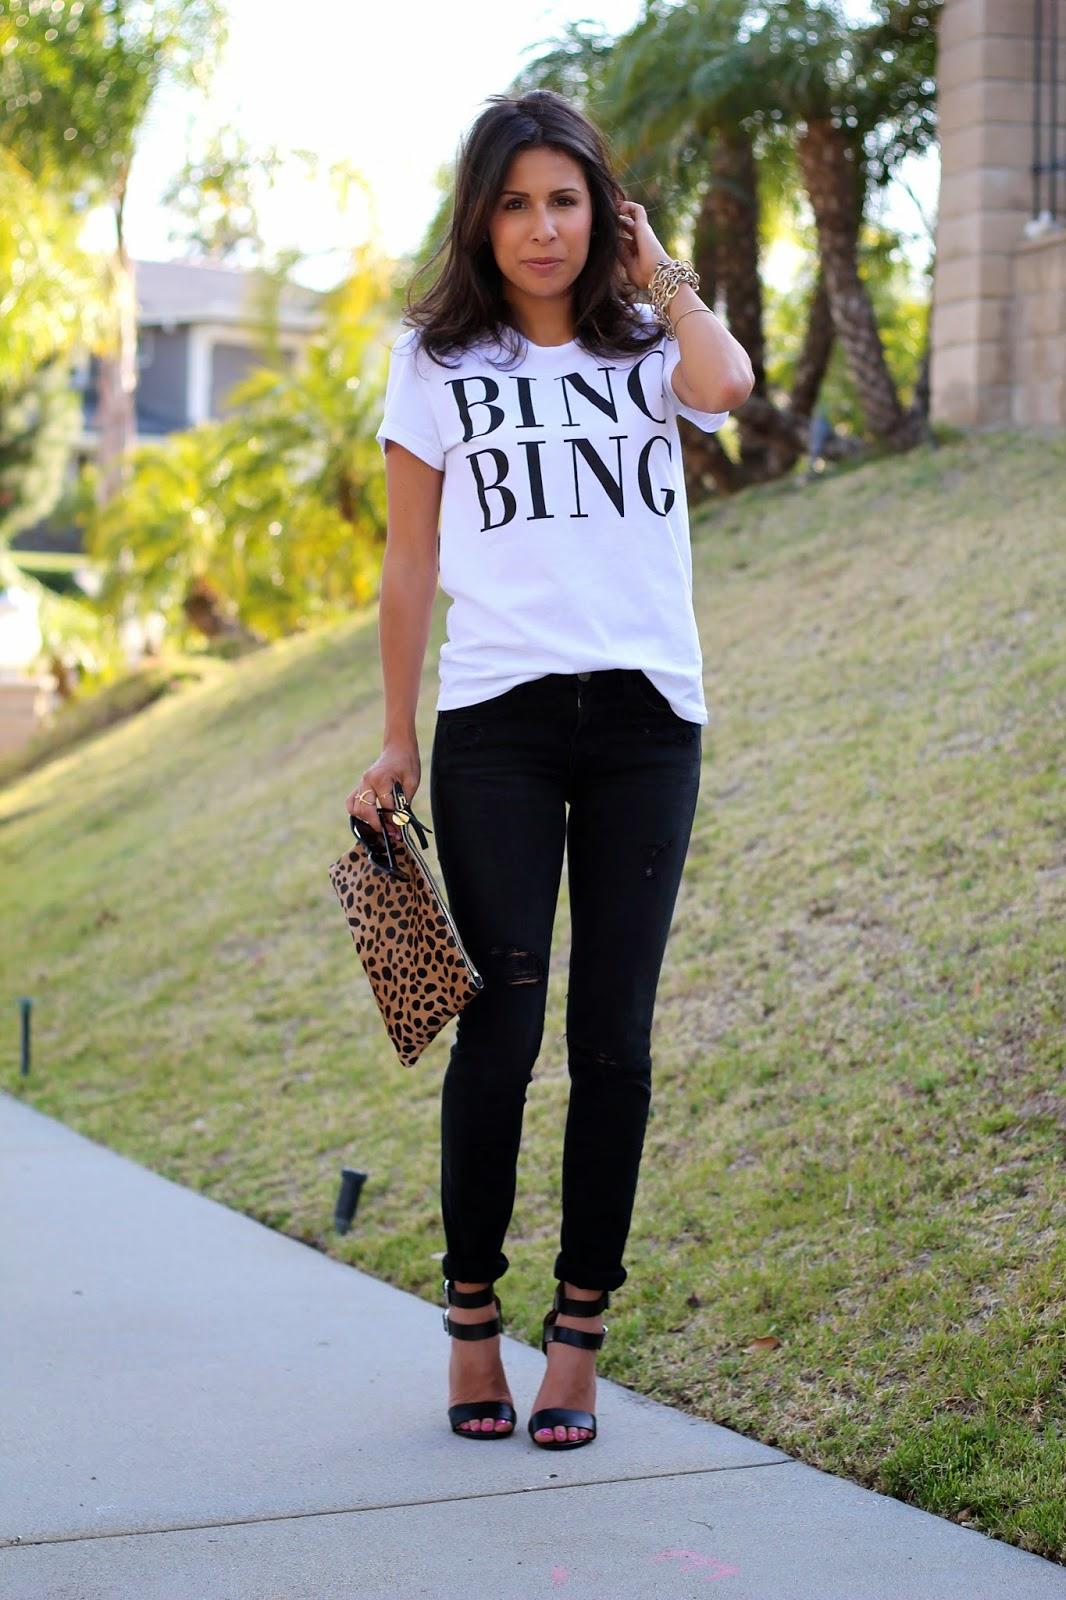 bing bing shirt current elliott skinnies